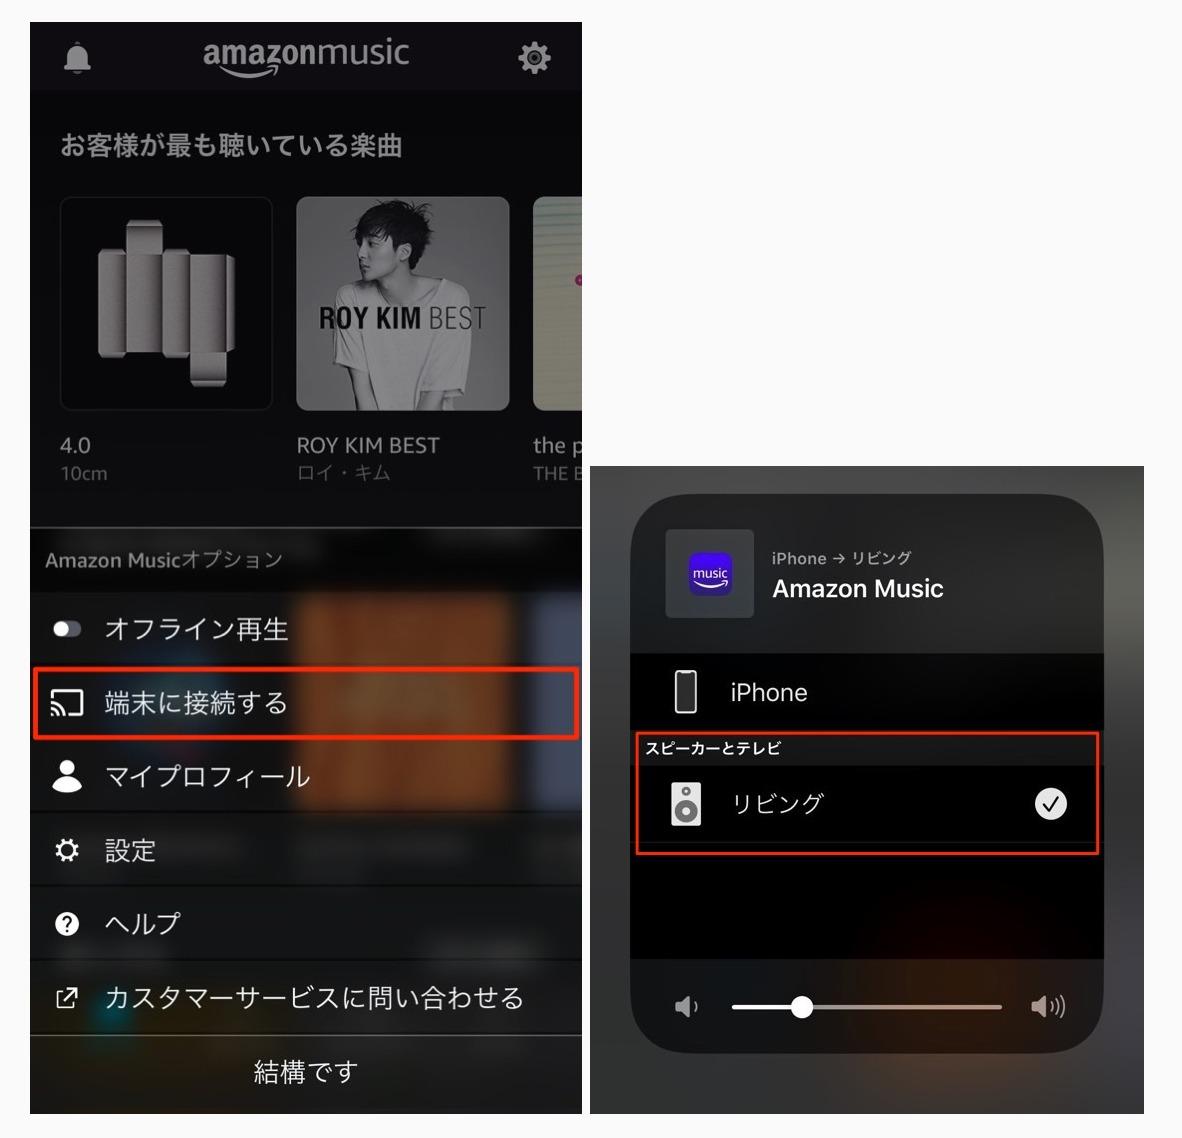 Bose Home Speaker 300 Amazonミュージック